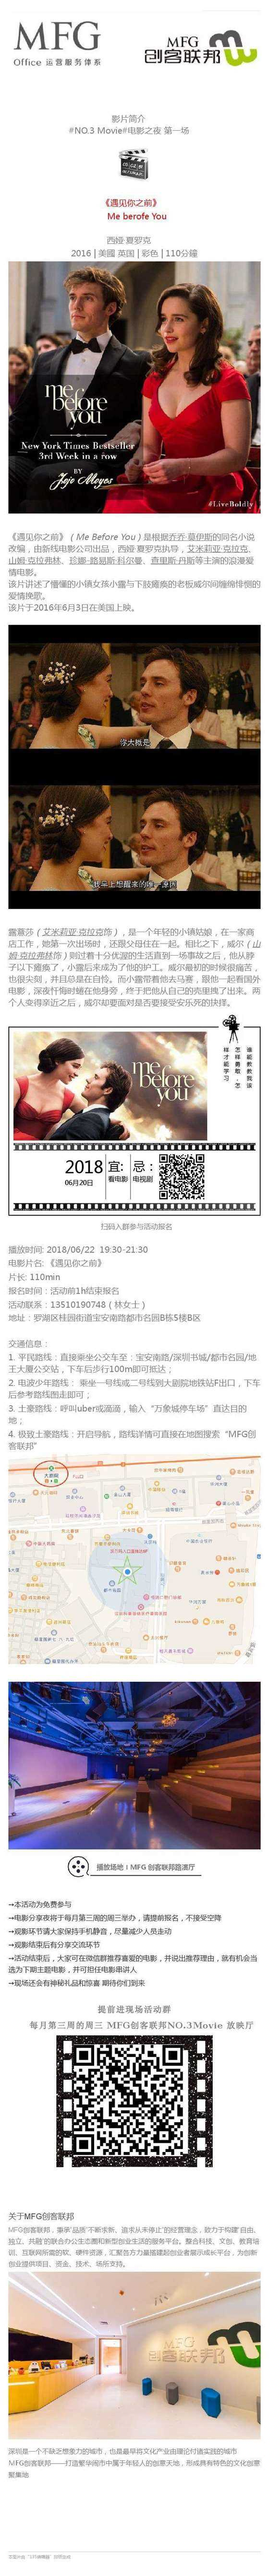 MFG创客联邦电影节-1.png